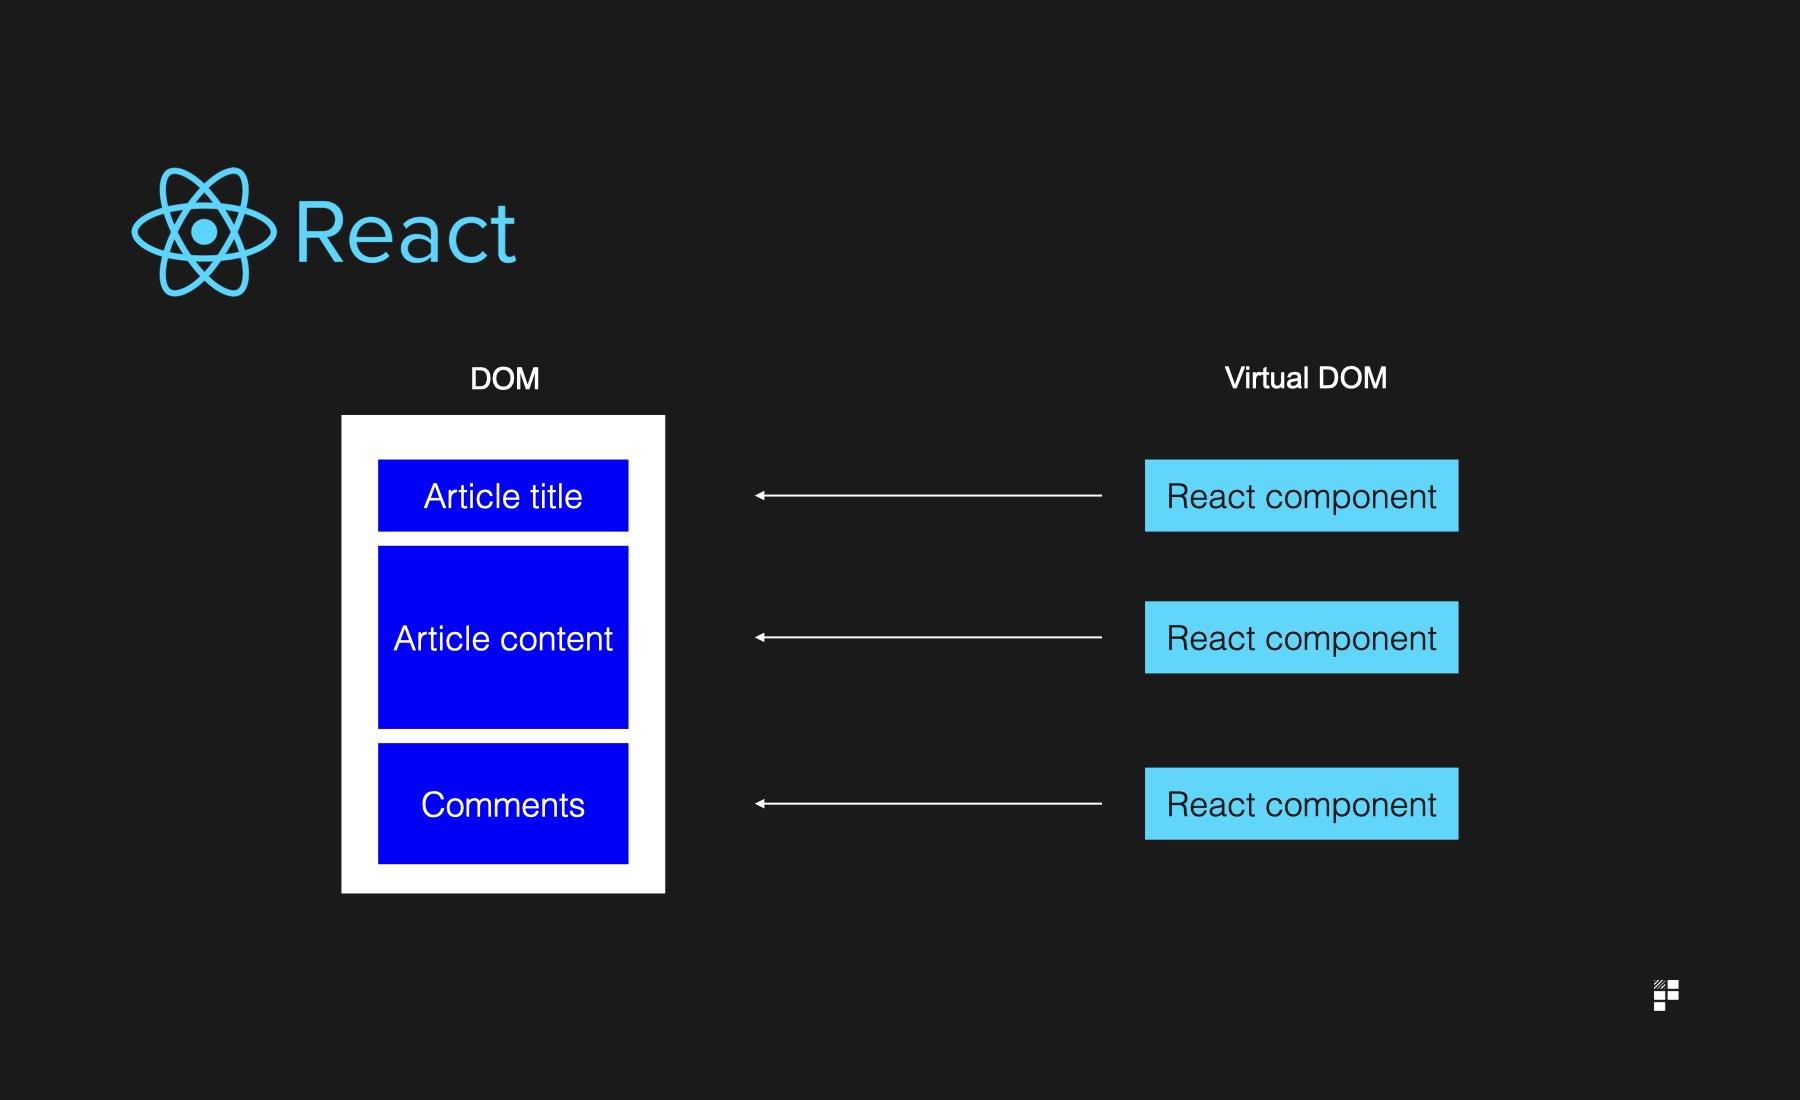 react virtual DOM